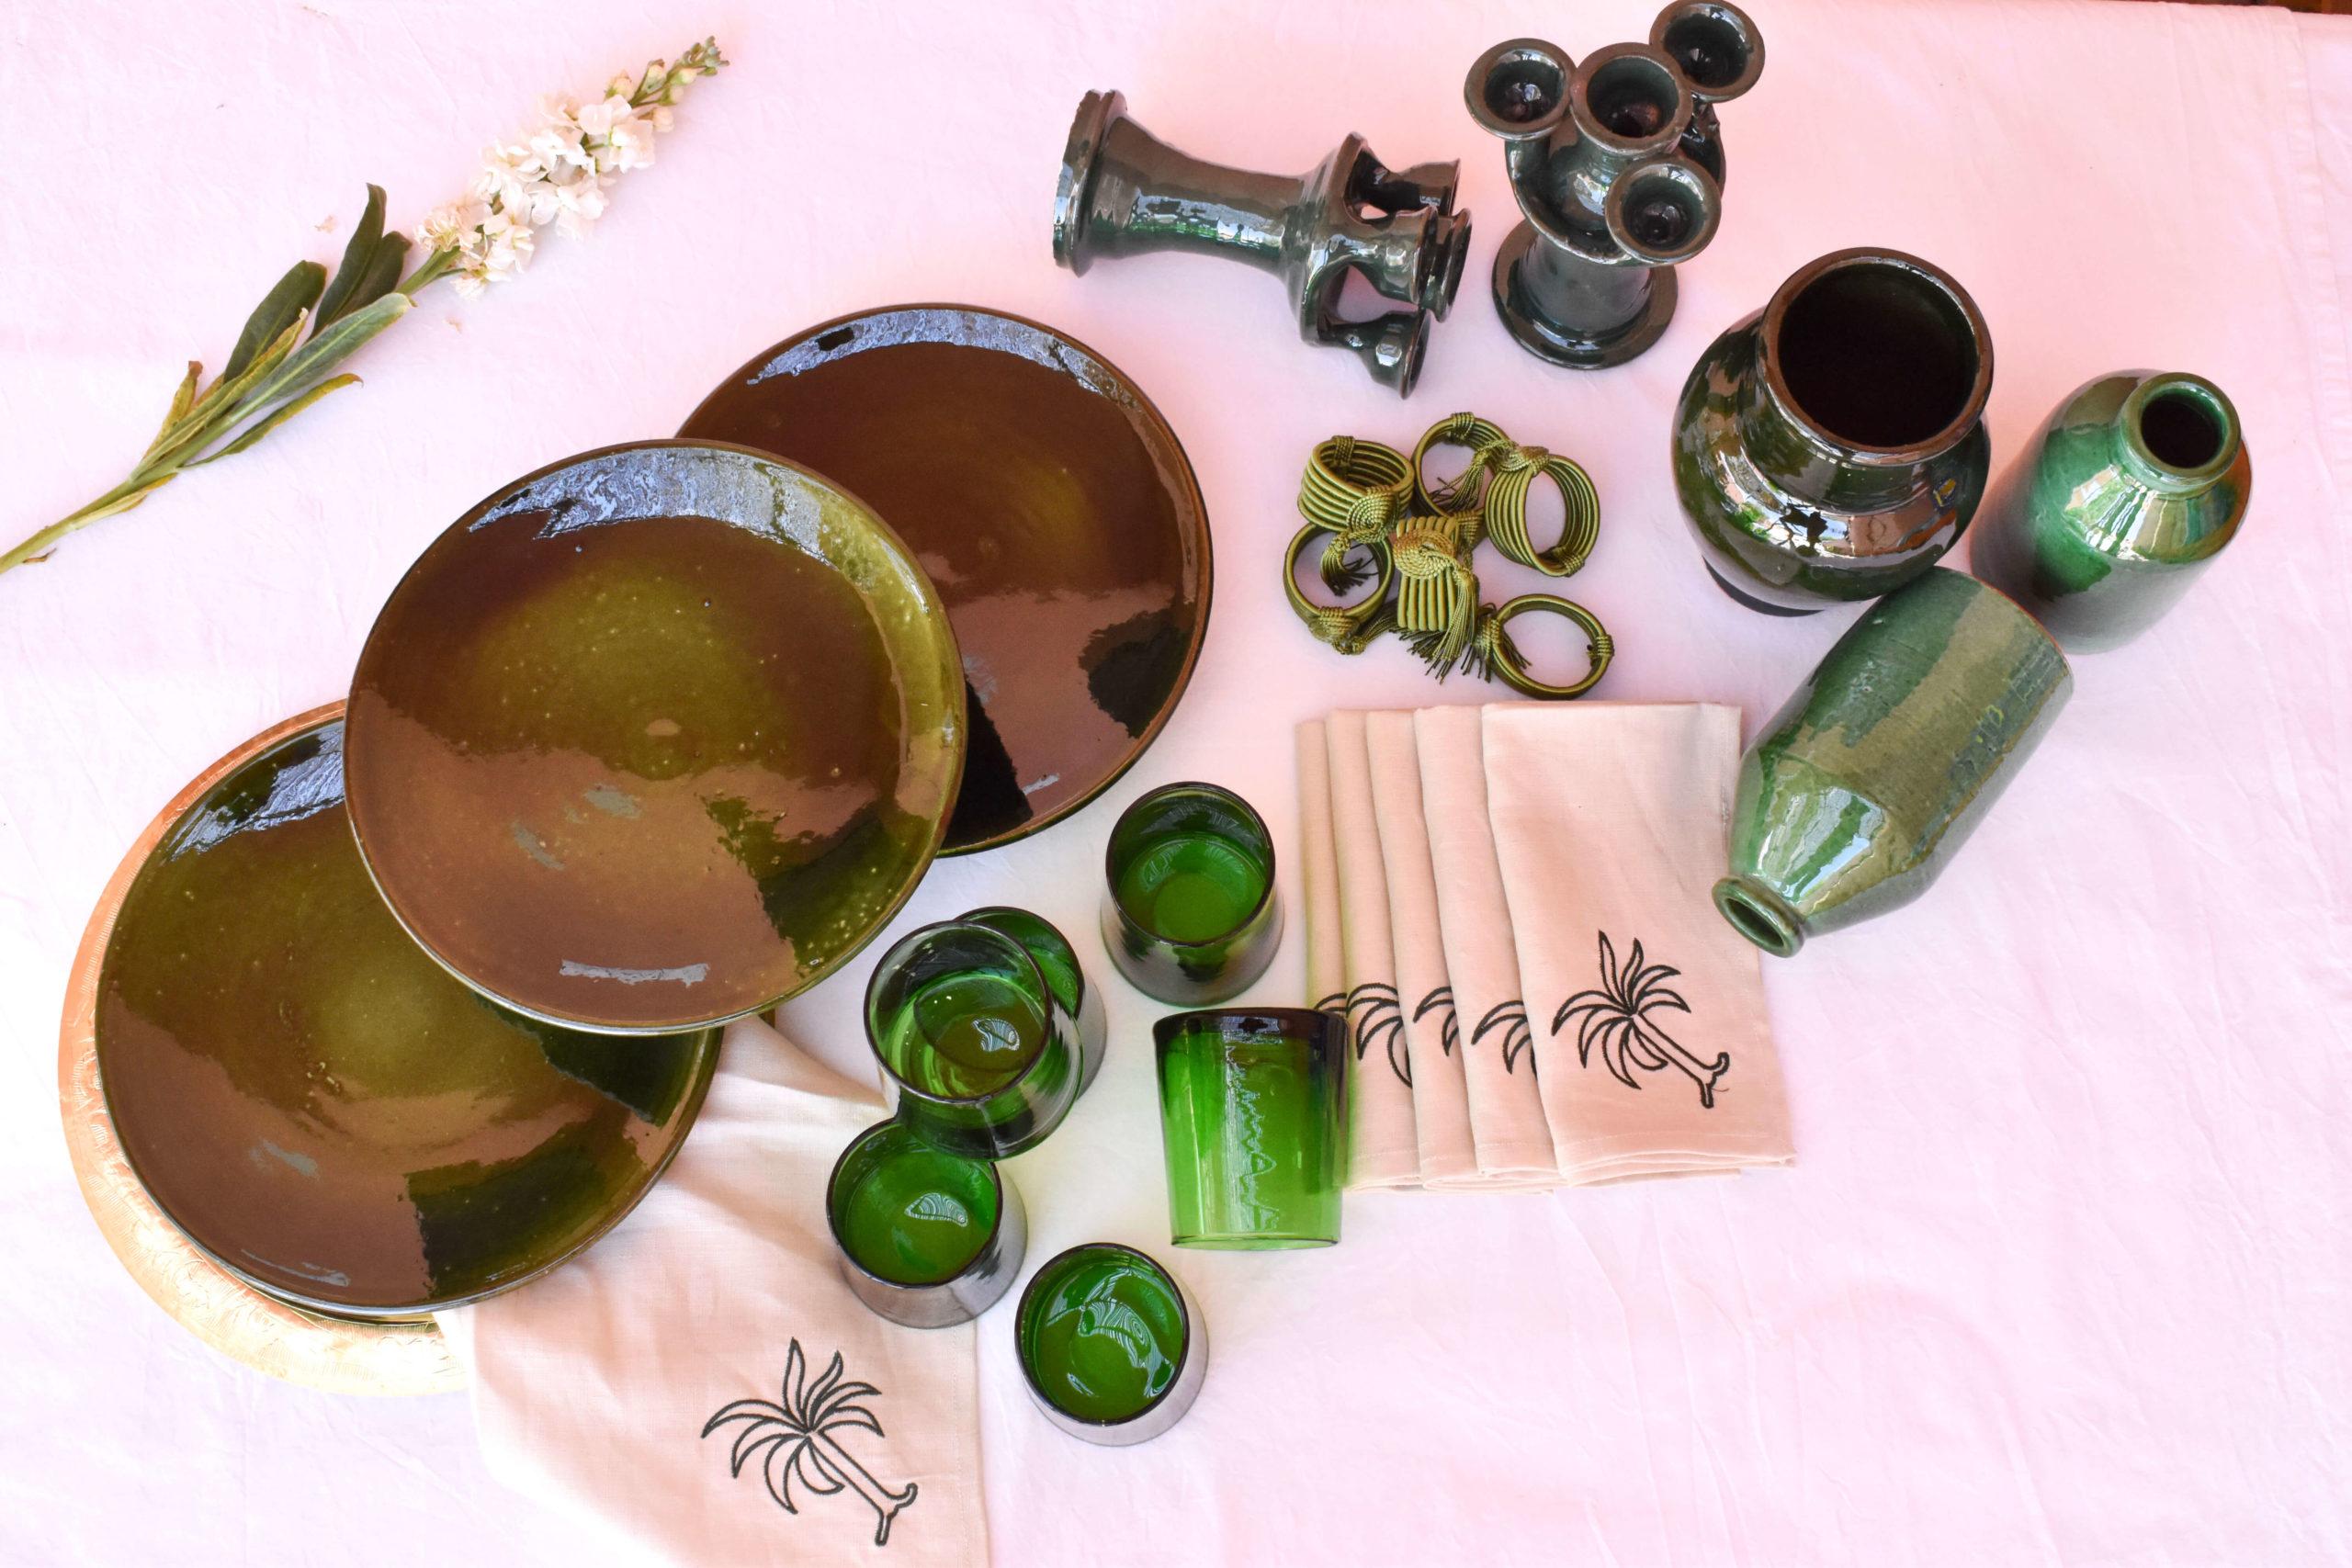 Handmade homeware green table setting dinnerware package view